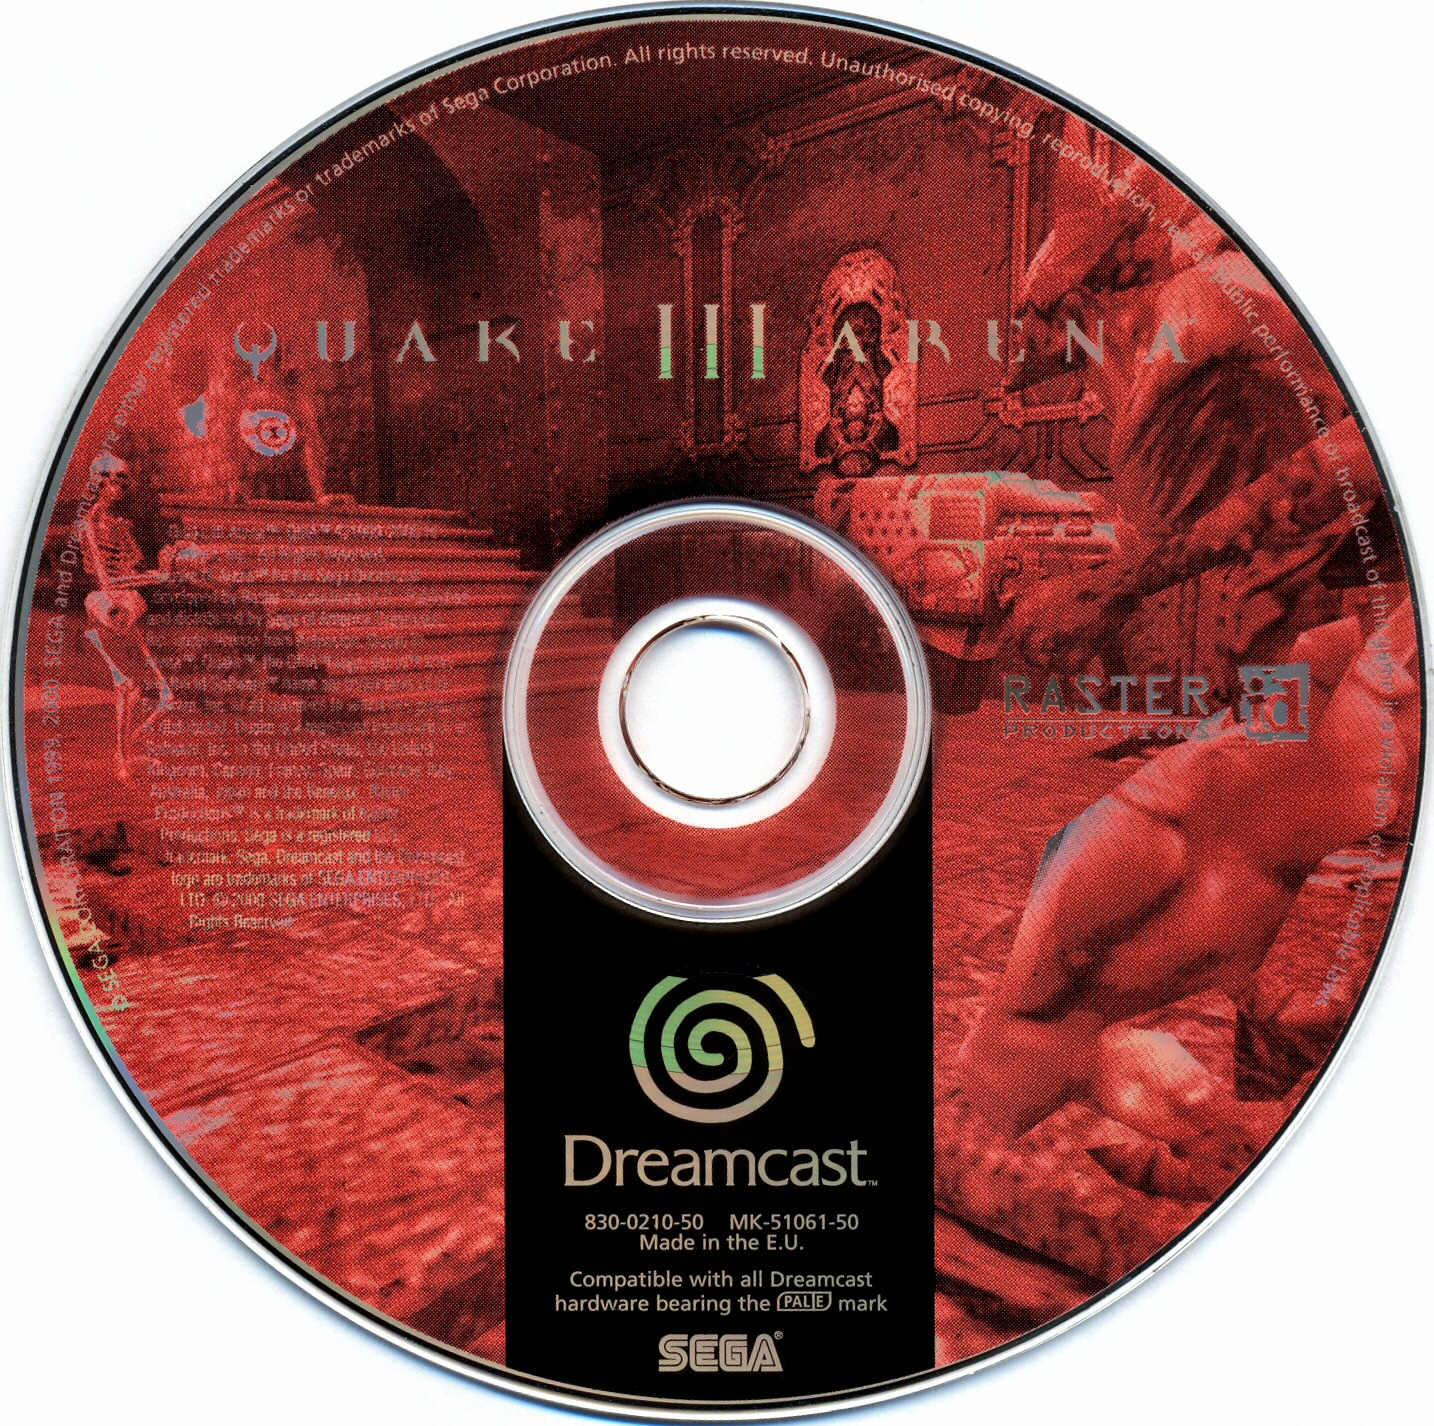 Doom Dreamcast Iso Direct // calamtiostuc gq